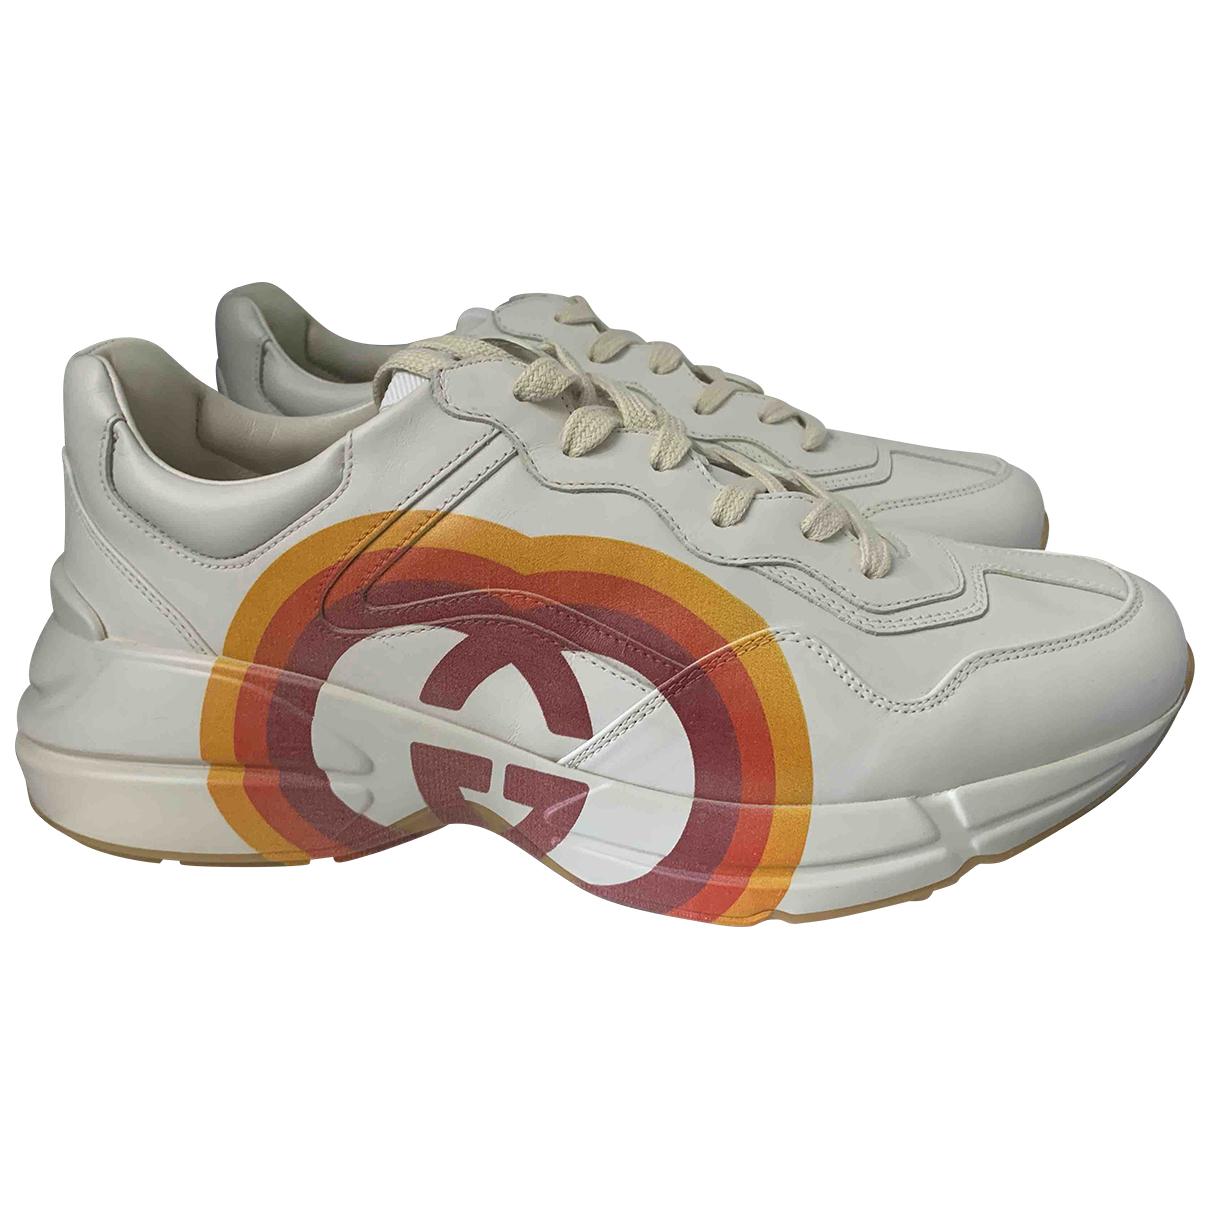 Gucci Rhyton Sneakers in  Weiss Leder